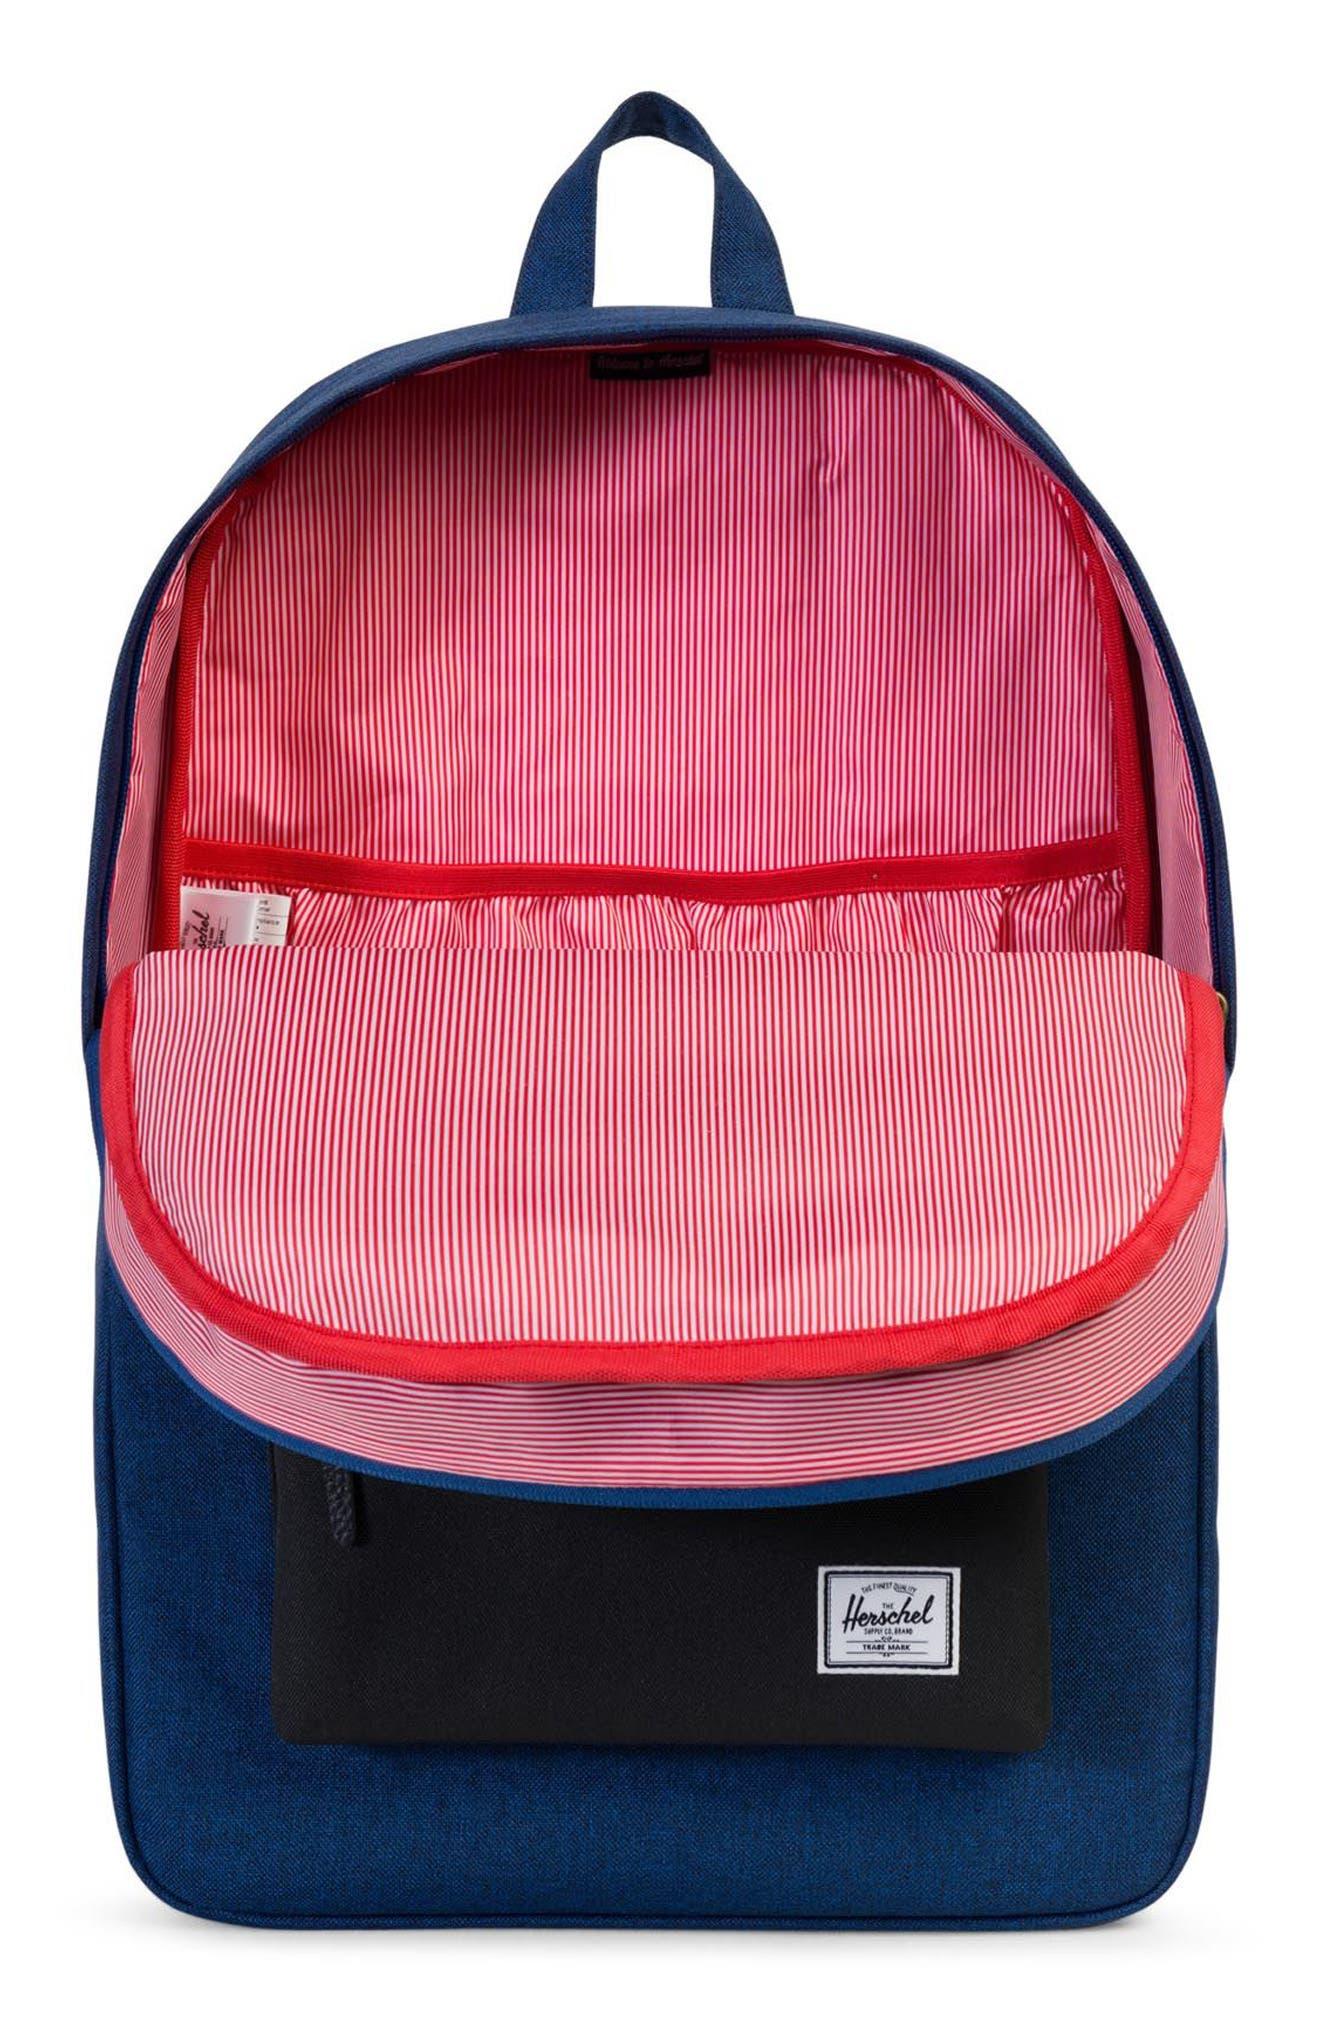 Heritage Backpack,                             Alternate thumbnail 4, color,                             Eclipse Crosshatch/ Black